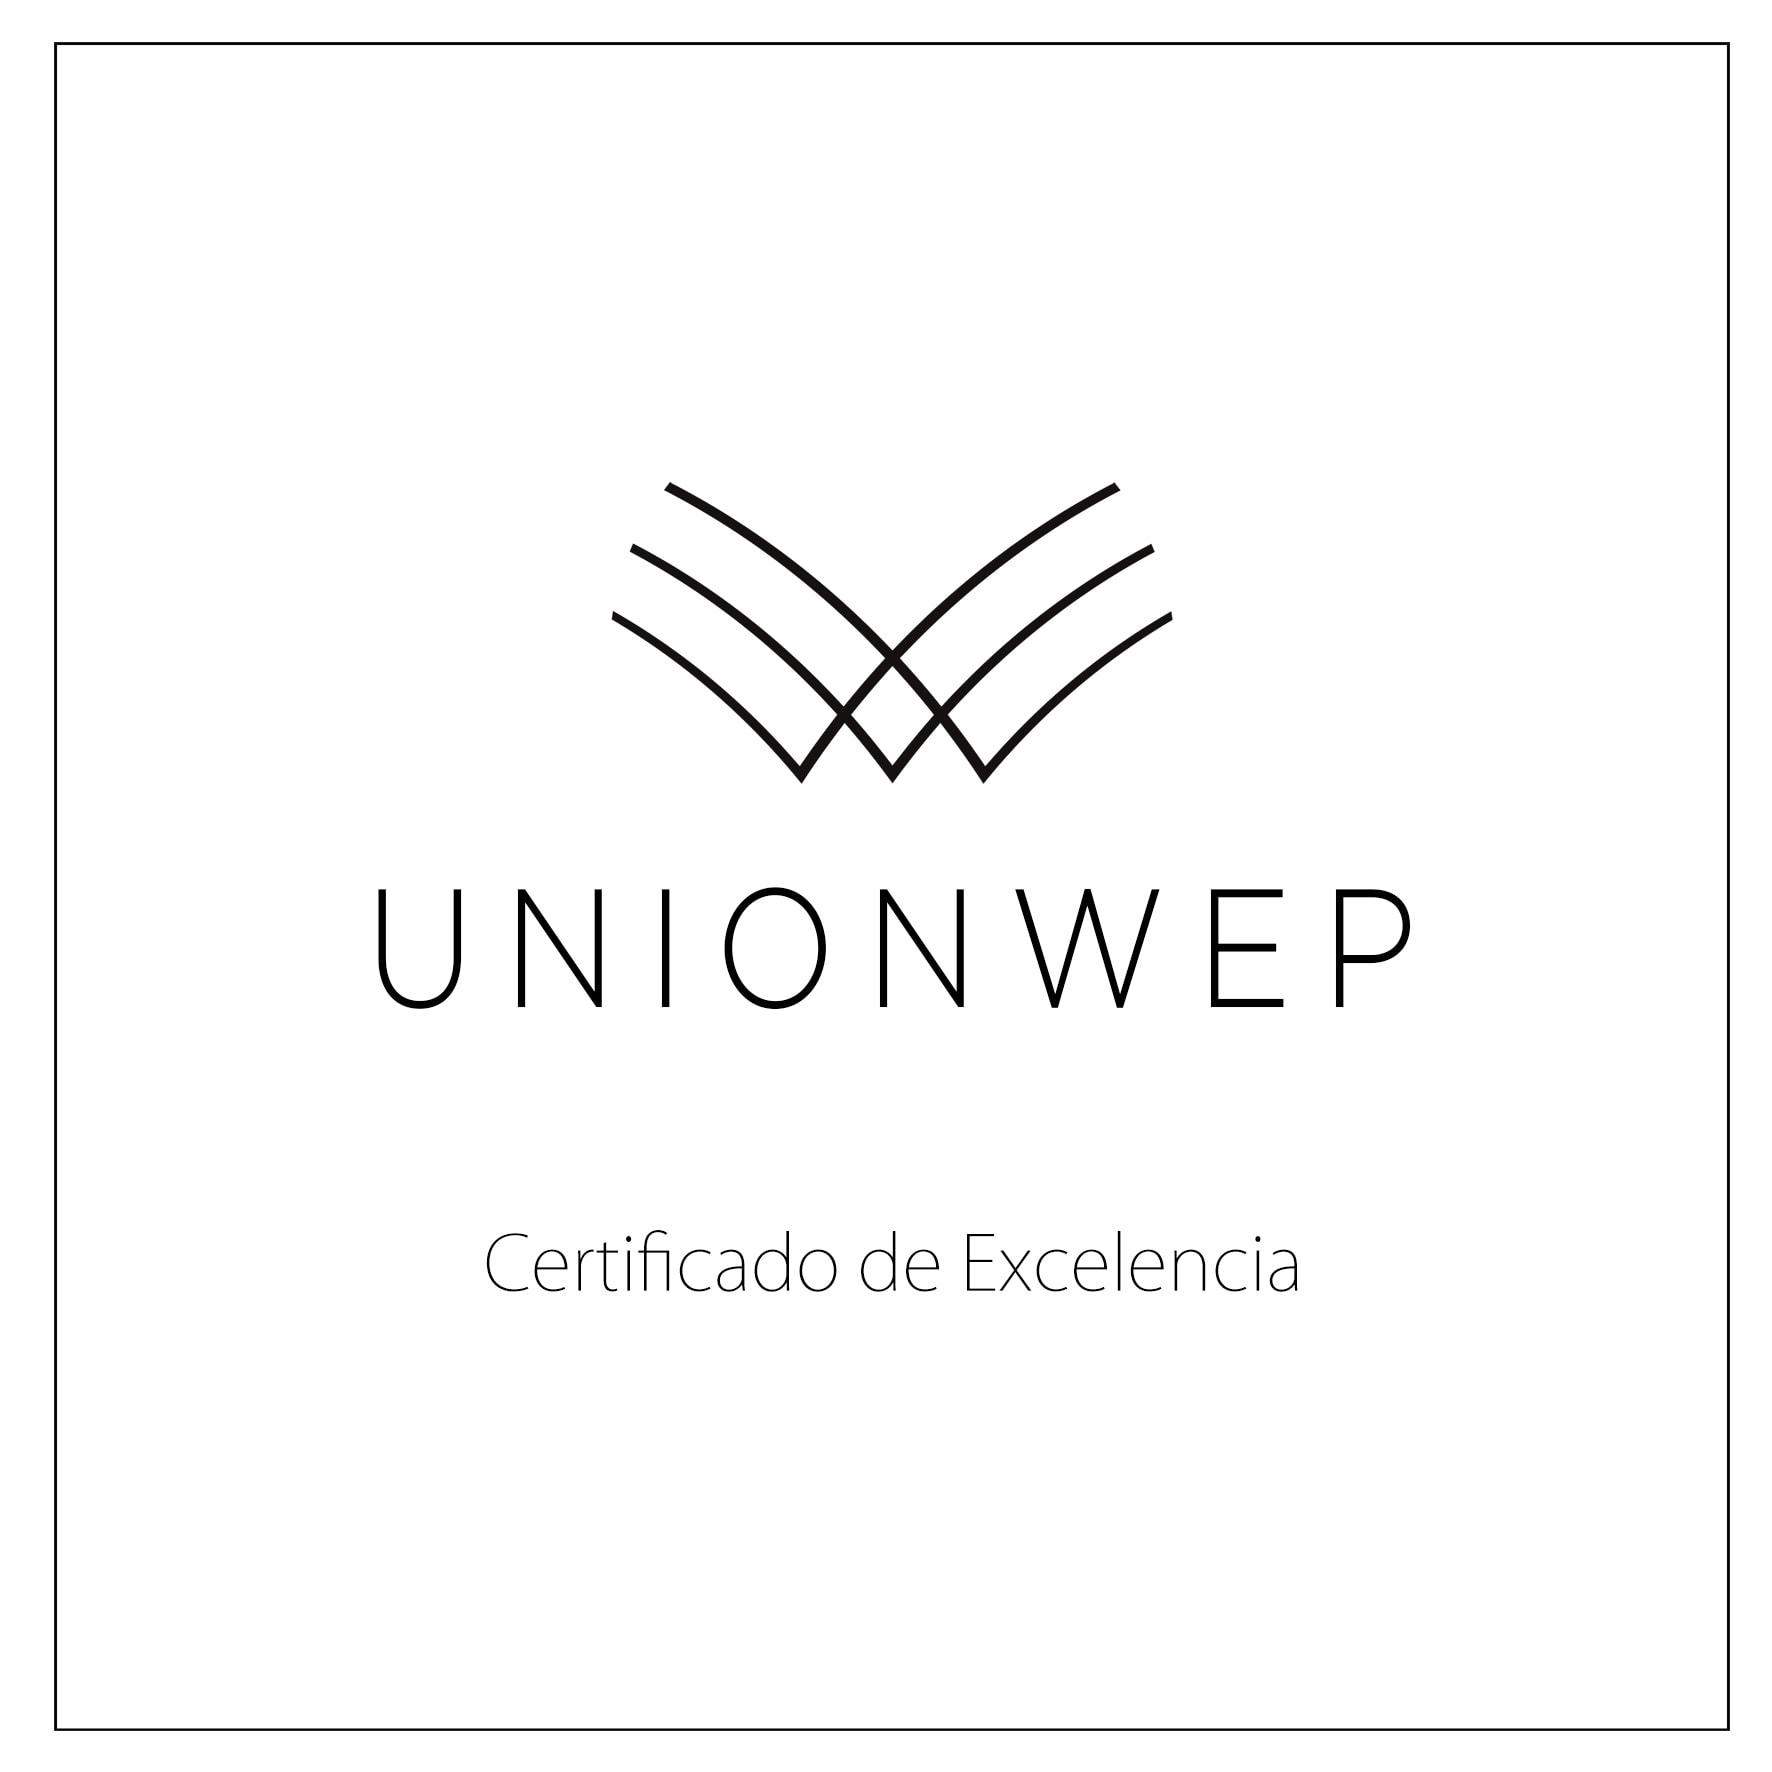 Los mejores fotografos de boda Unionwep Flecha en Blanco Pepa Malaga Fotografia